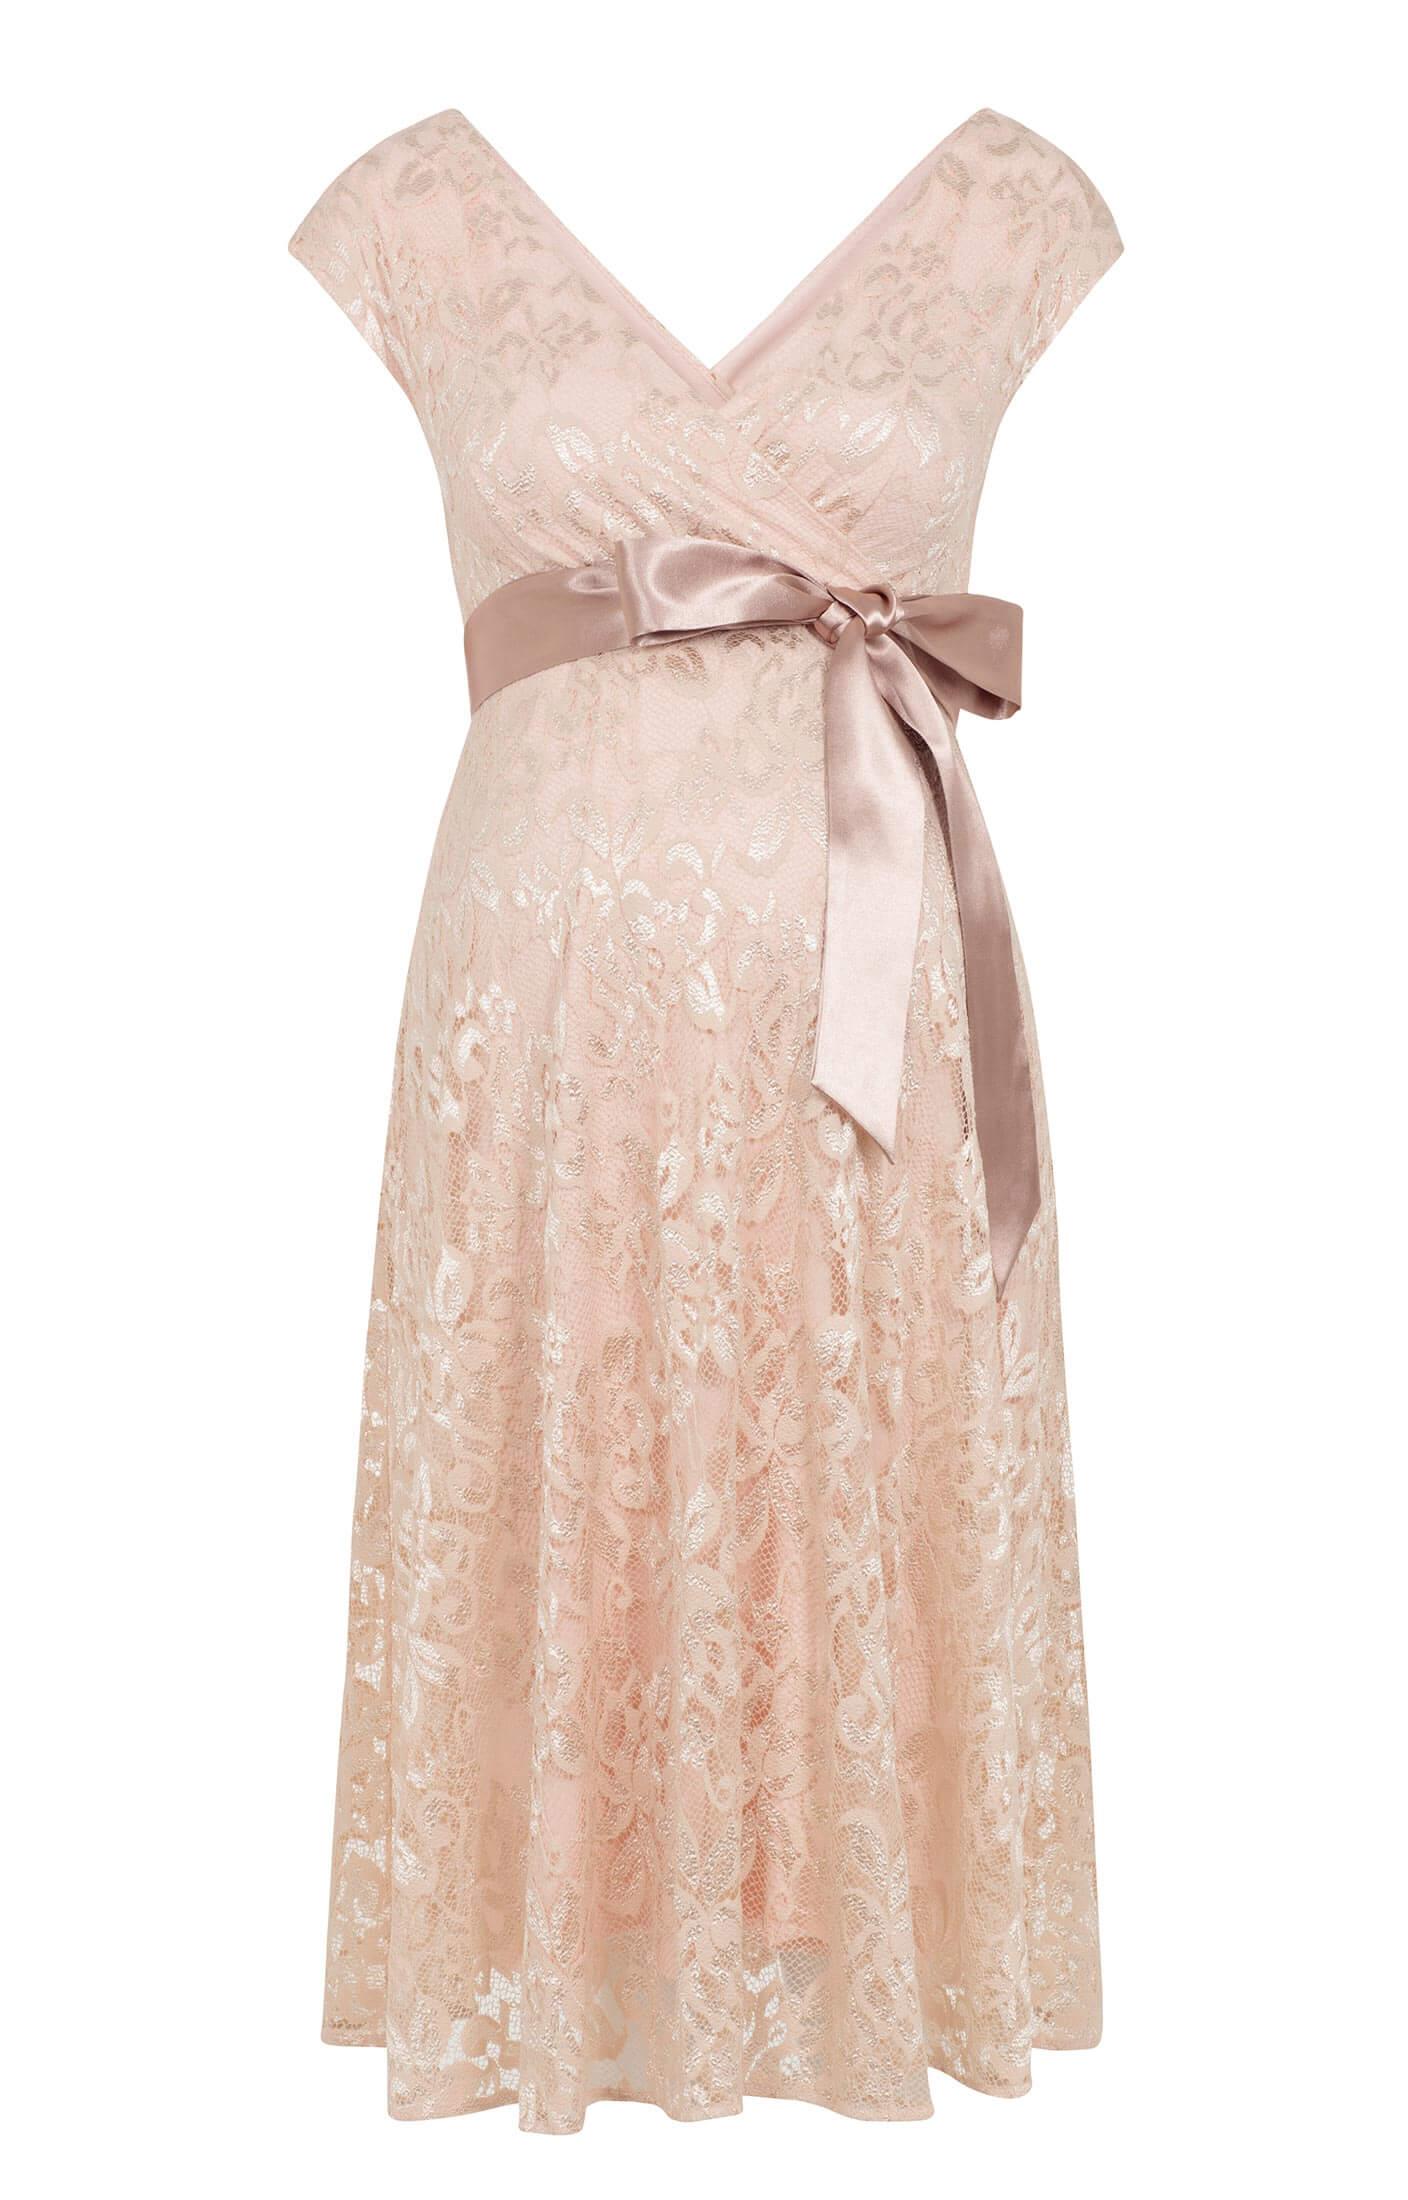 Orla Maternity Lace Dress Pearl Blush Maternity Wedding